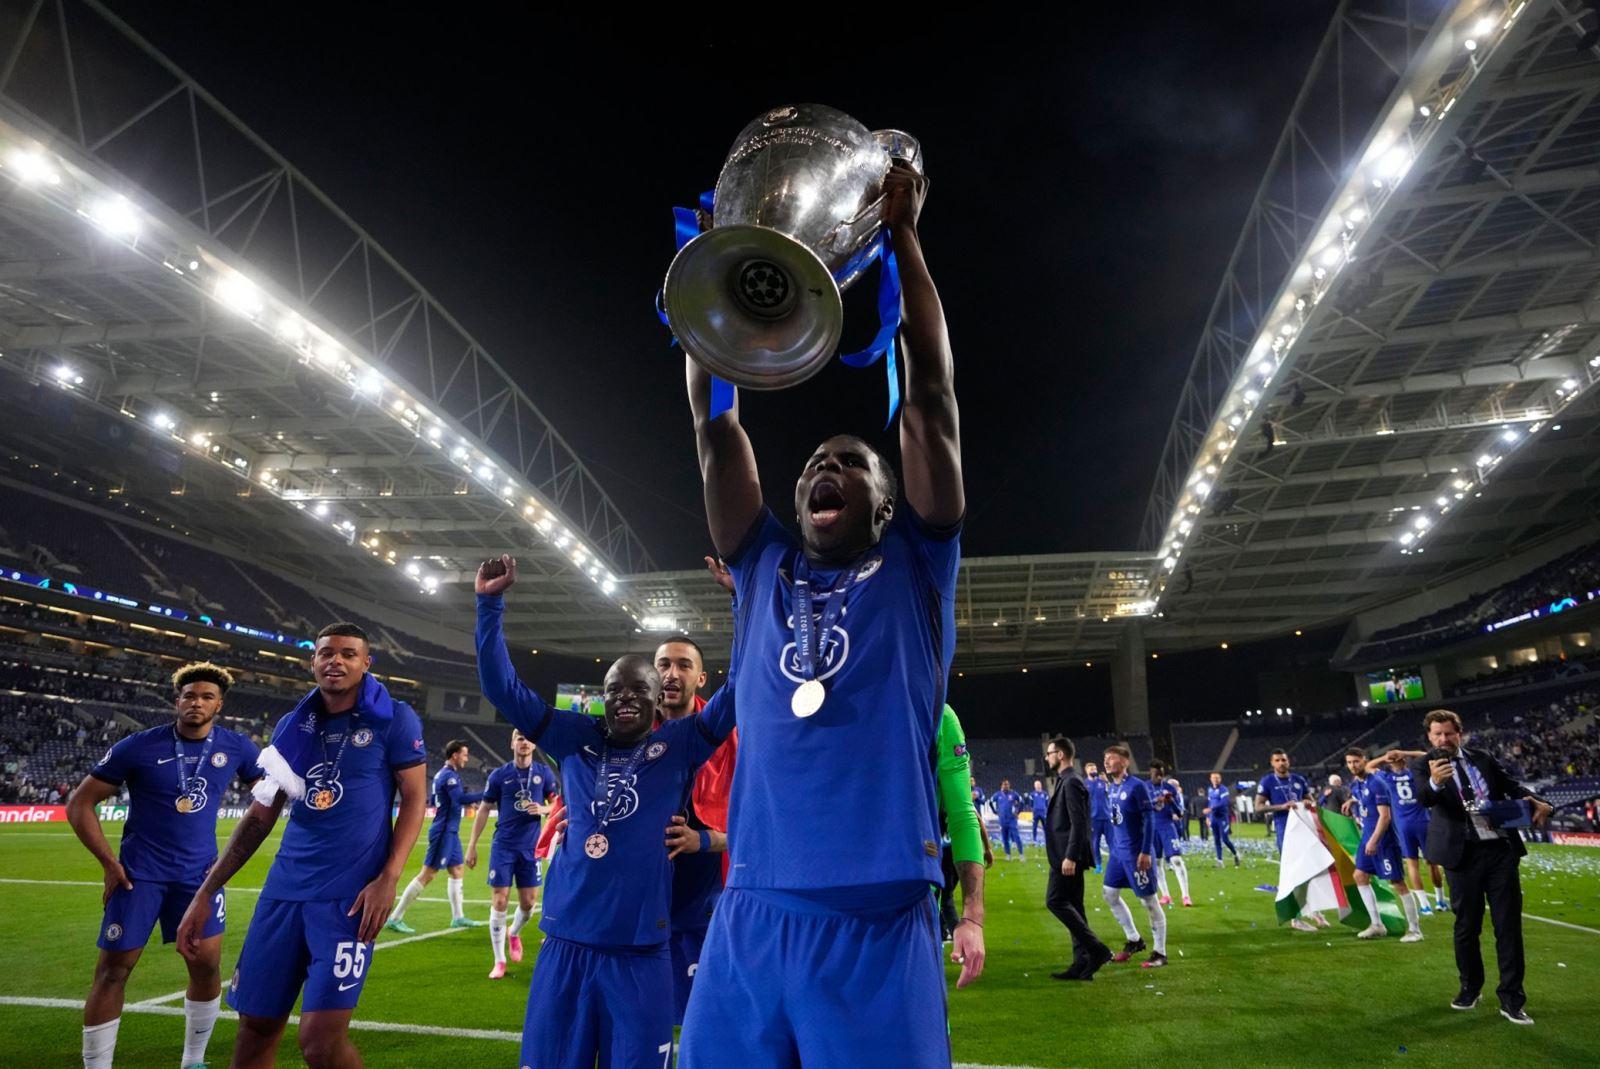 Kết quả Chung kết cúp C1, Man City 0-1 Chelsea, Kết quả bóng đá Cúp C1, Kết quả  chung kết Champions League, Kết quả Man City đấu với Chelsea, Guardiola, ket qua bong da, mu, pogba, ronaldo, juventus